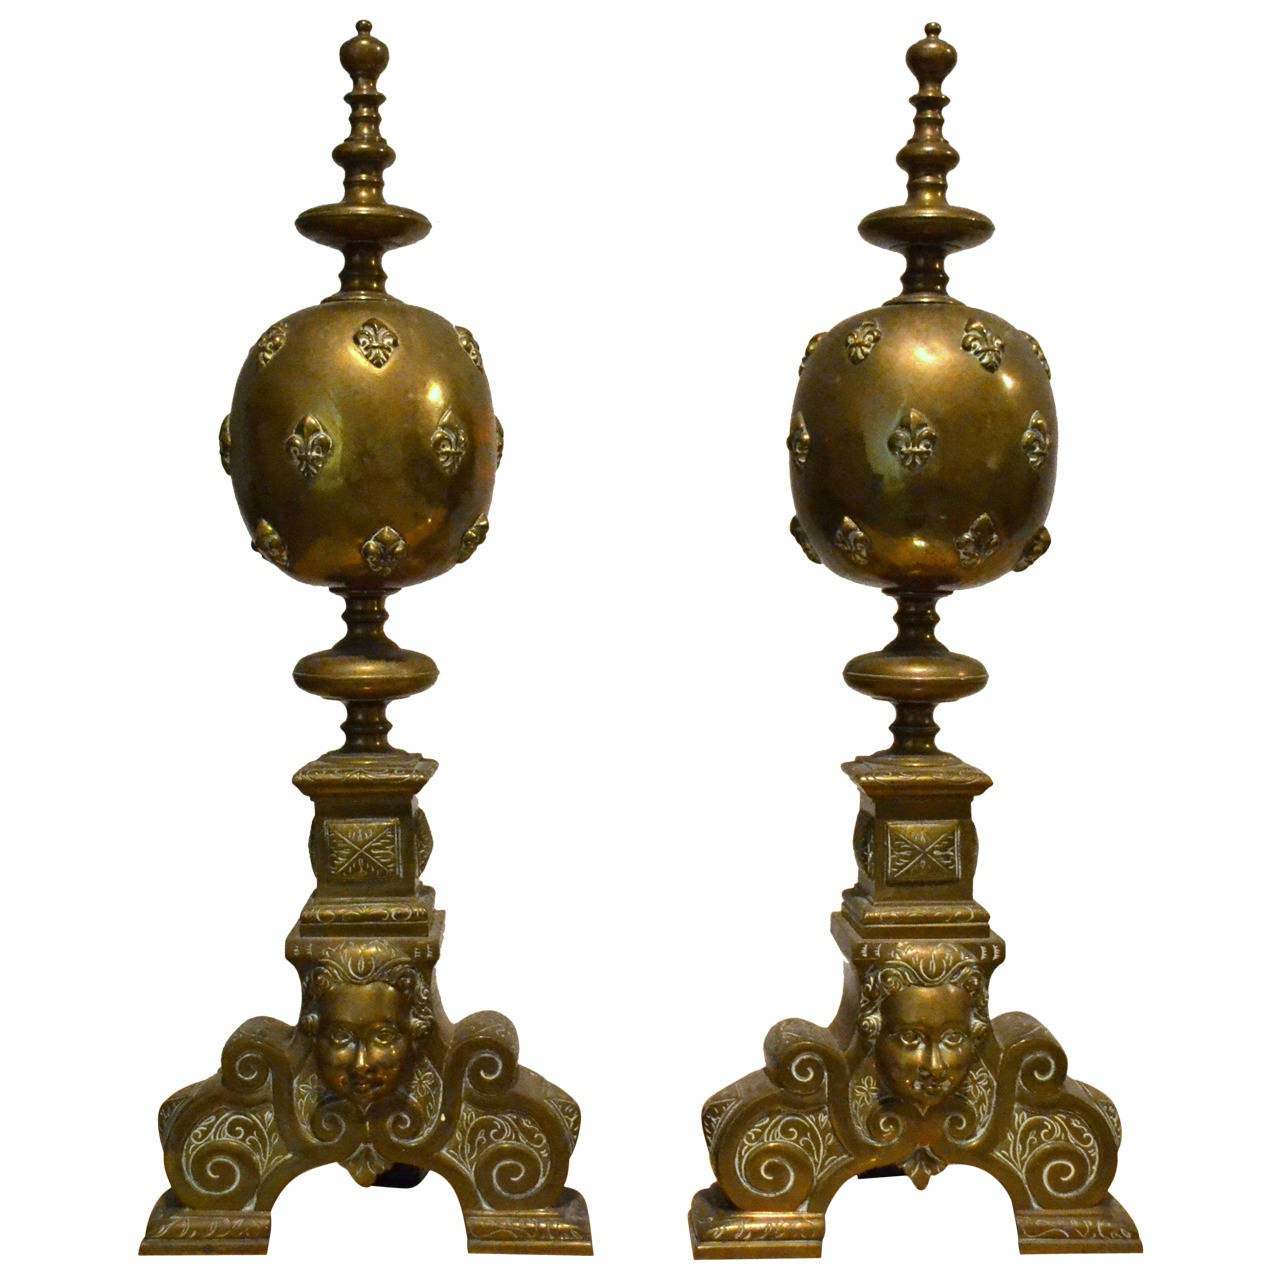 Monumental Pair of Brass Andirons with Fleur de Lys Motif